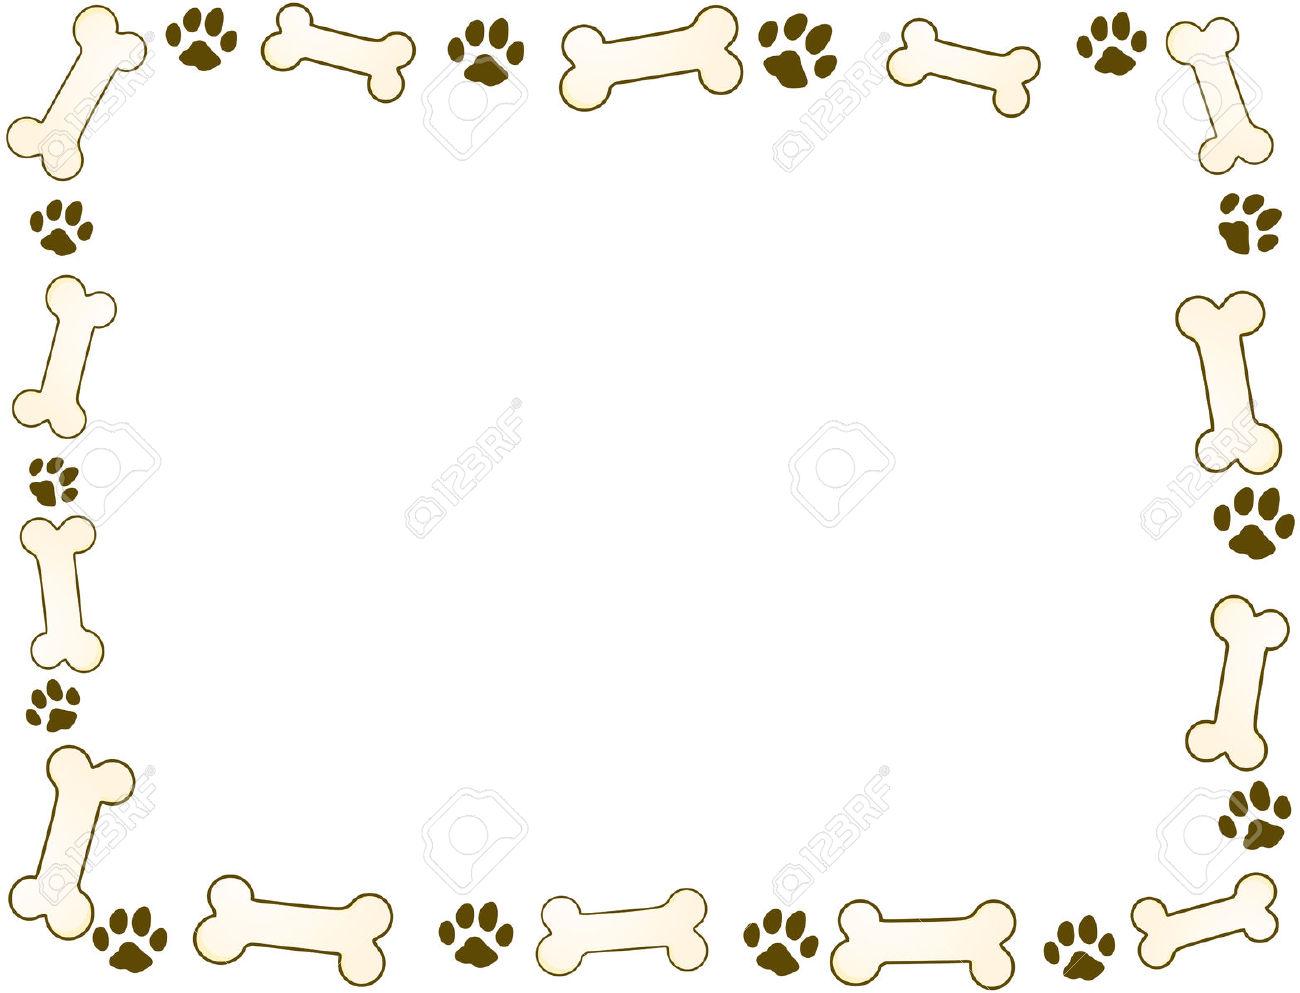 Dog Bone Clipart Border.